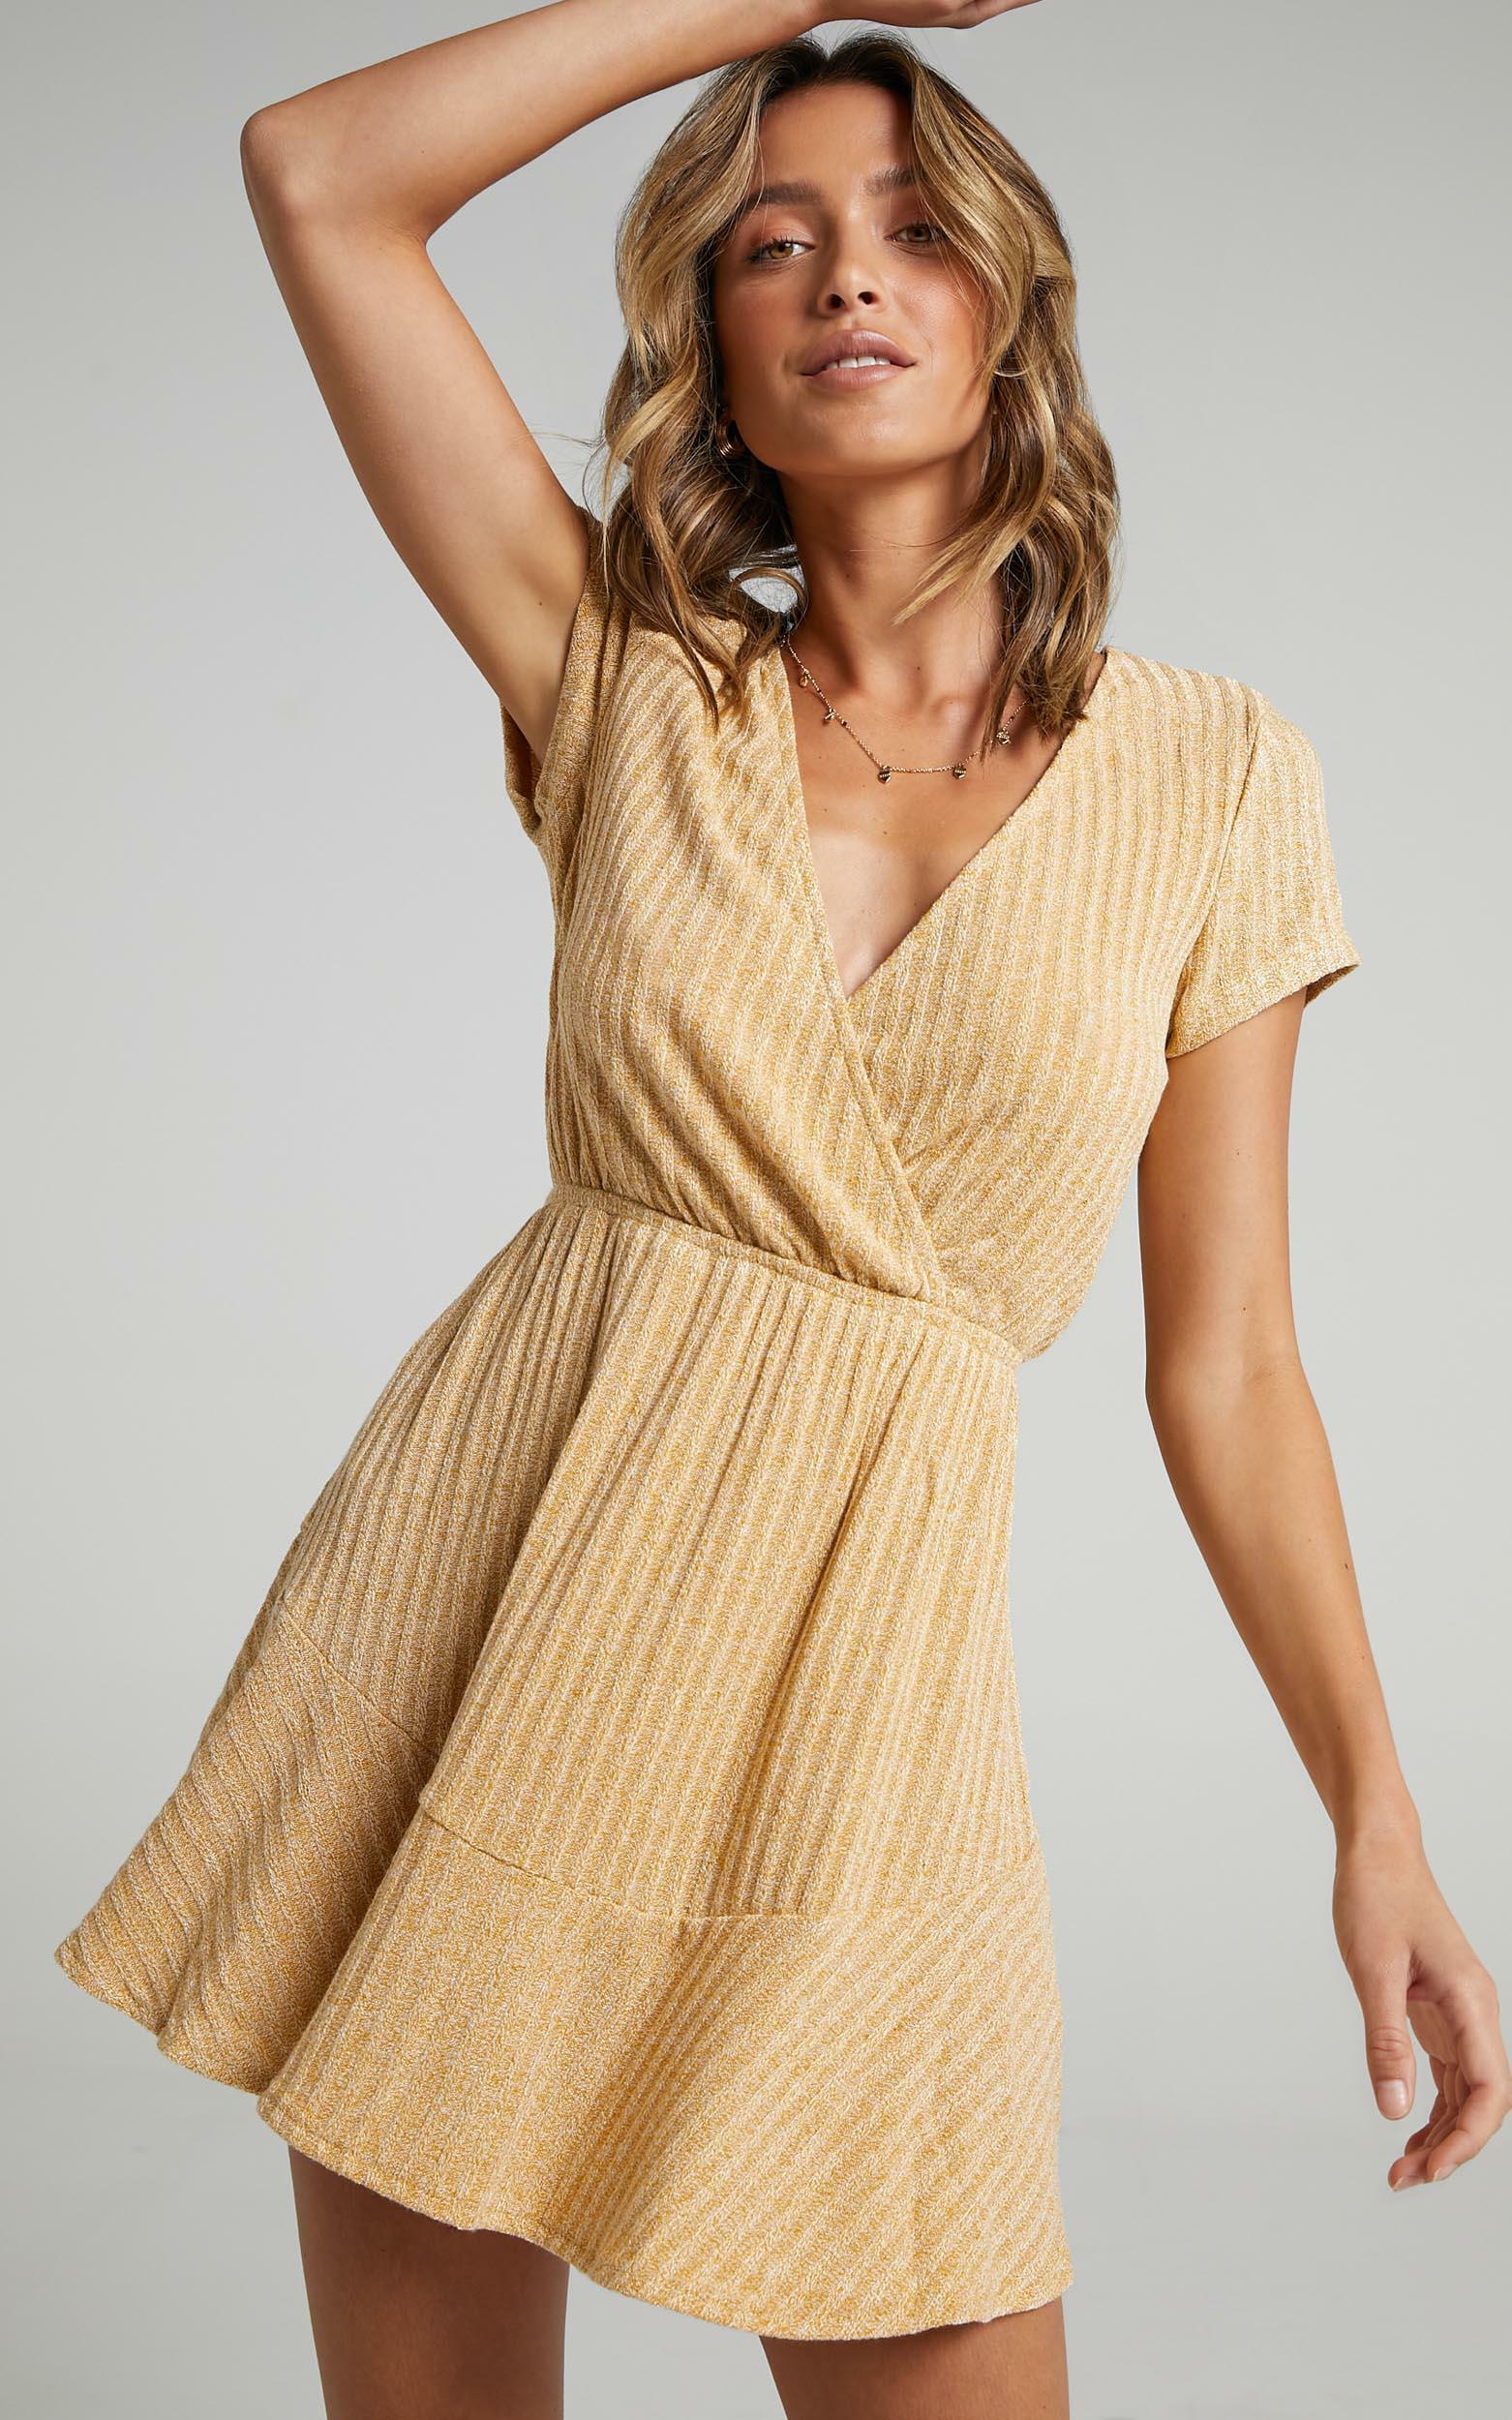 Sweet Feeling Dress in mustard - 20 (XXXXL), Mustard, hi-res image number null